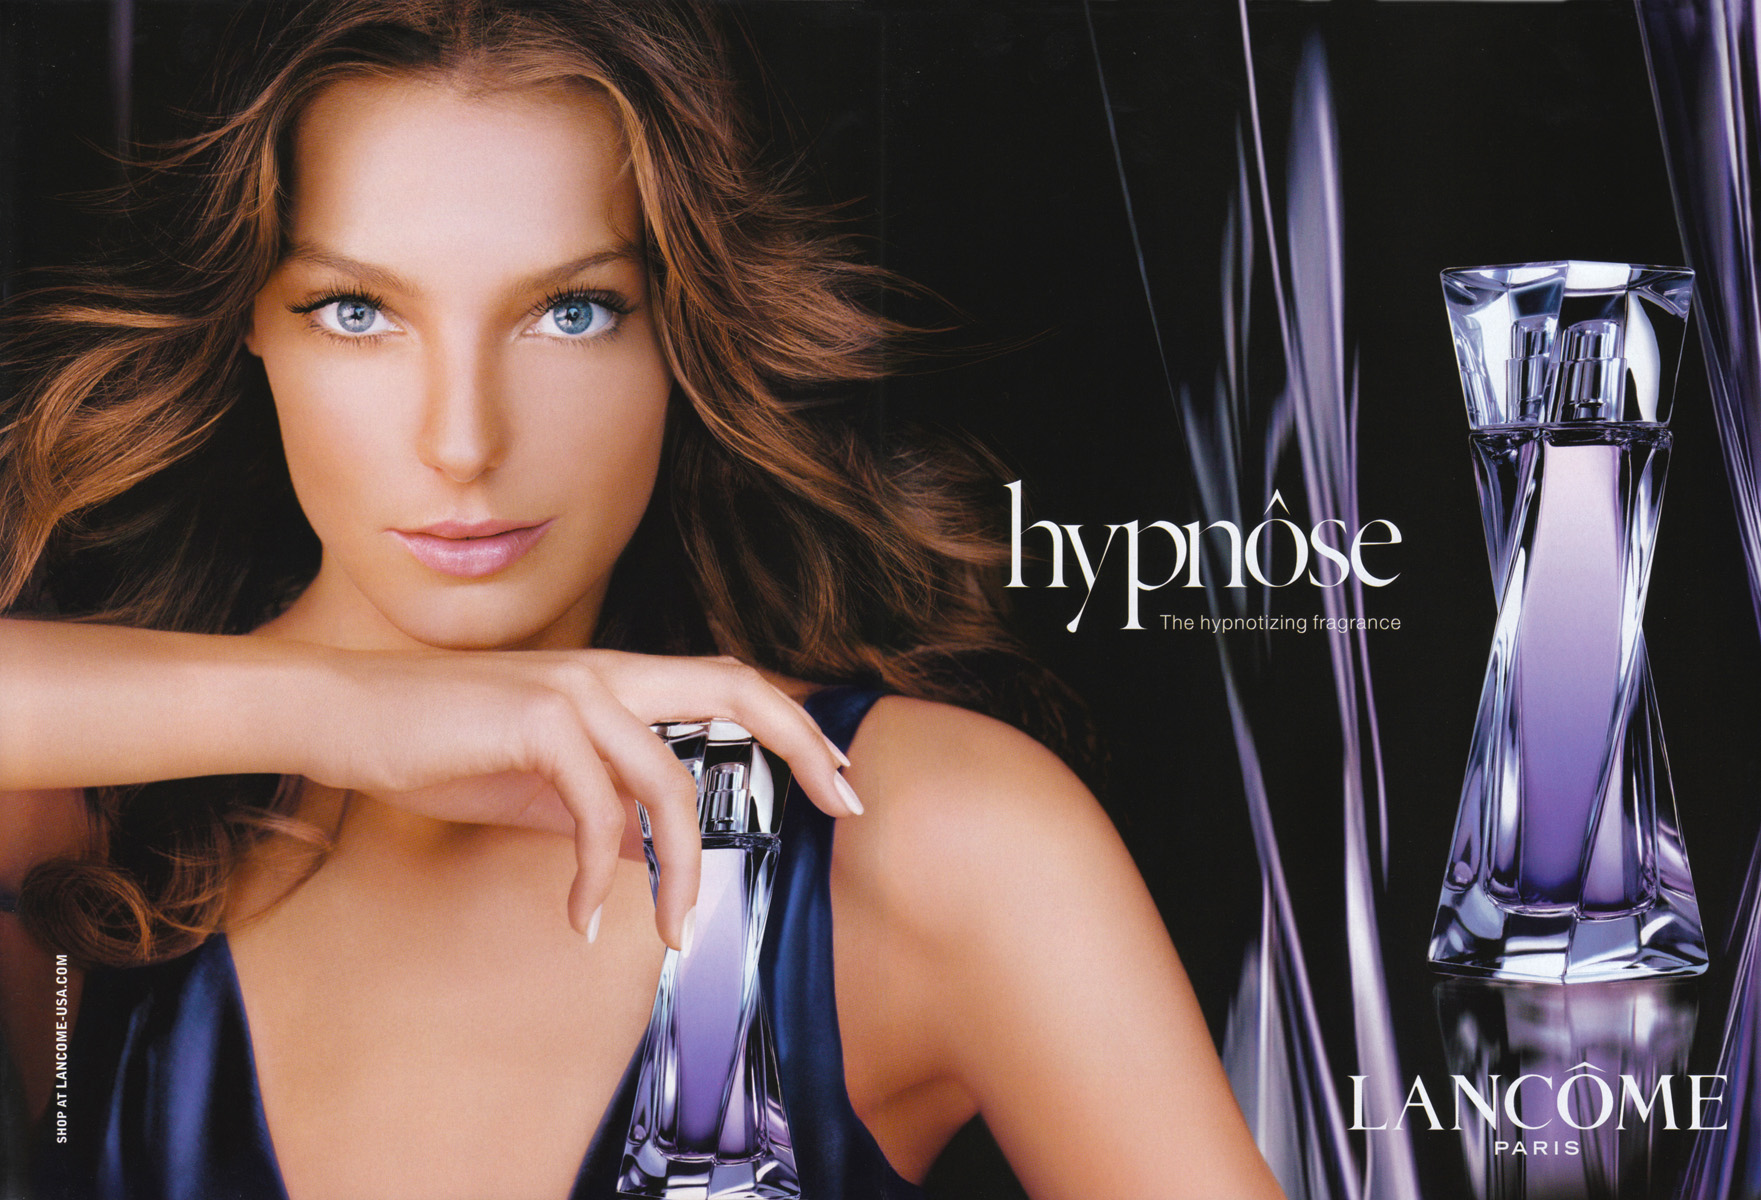 Hypnose_Lancome_Parfum_Ad_1.jpg